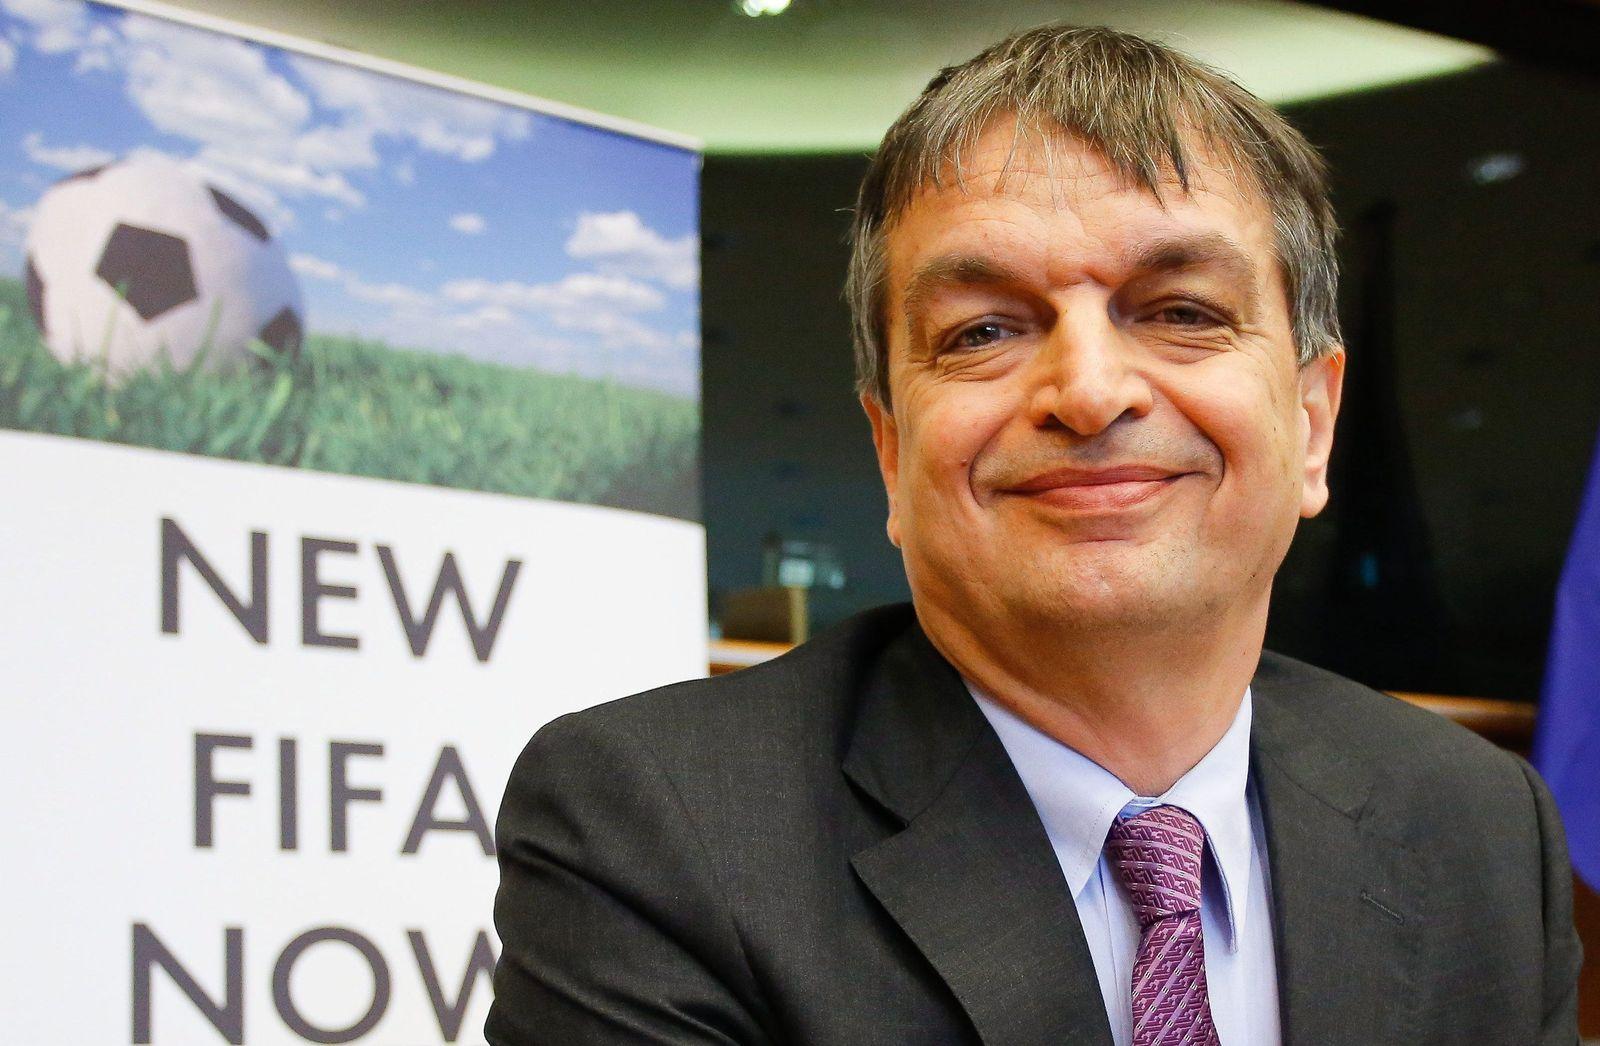 FIFA coalition meeting at the European Parliament